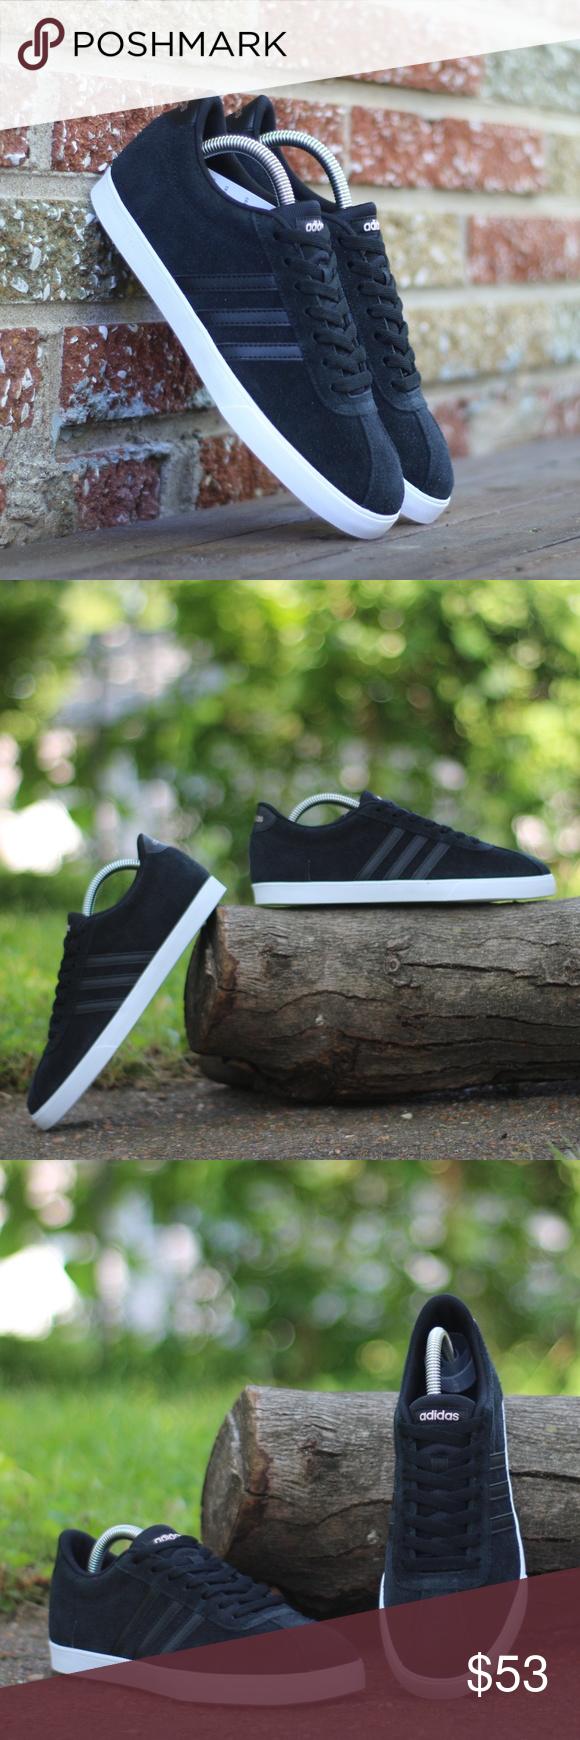 adidas donne '9 courtset scamosciato scarpe bb9657 boutique camoscio